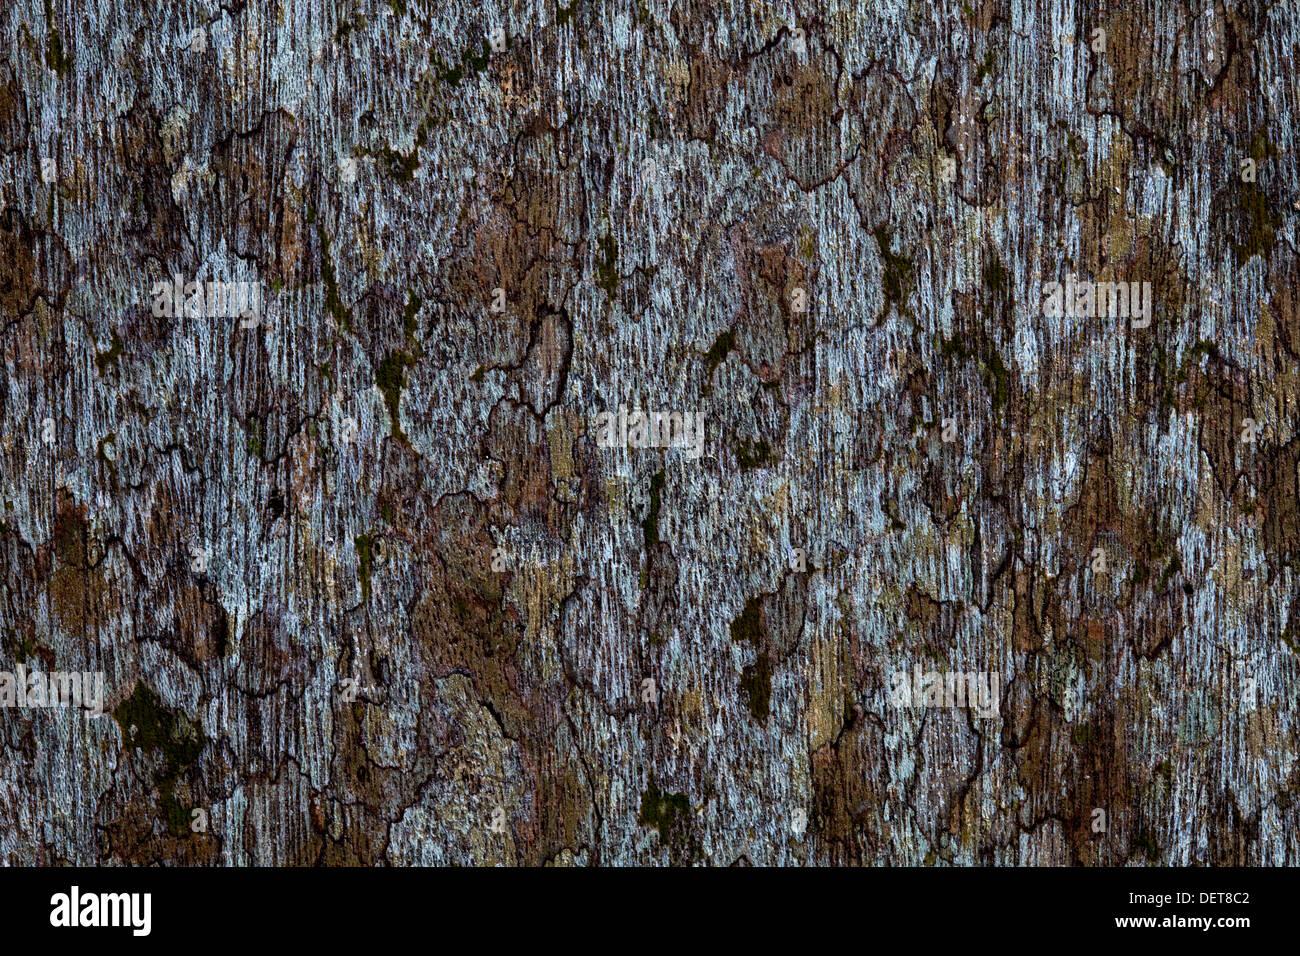 wood texture color shape volume line contrast background